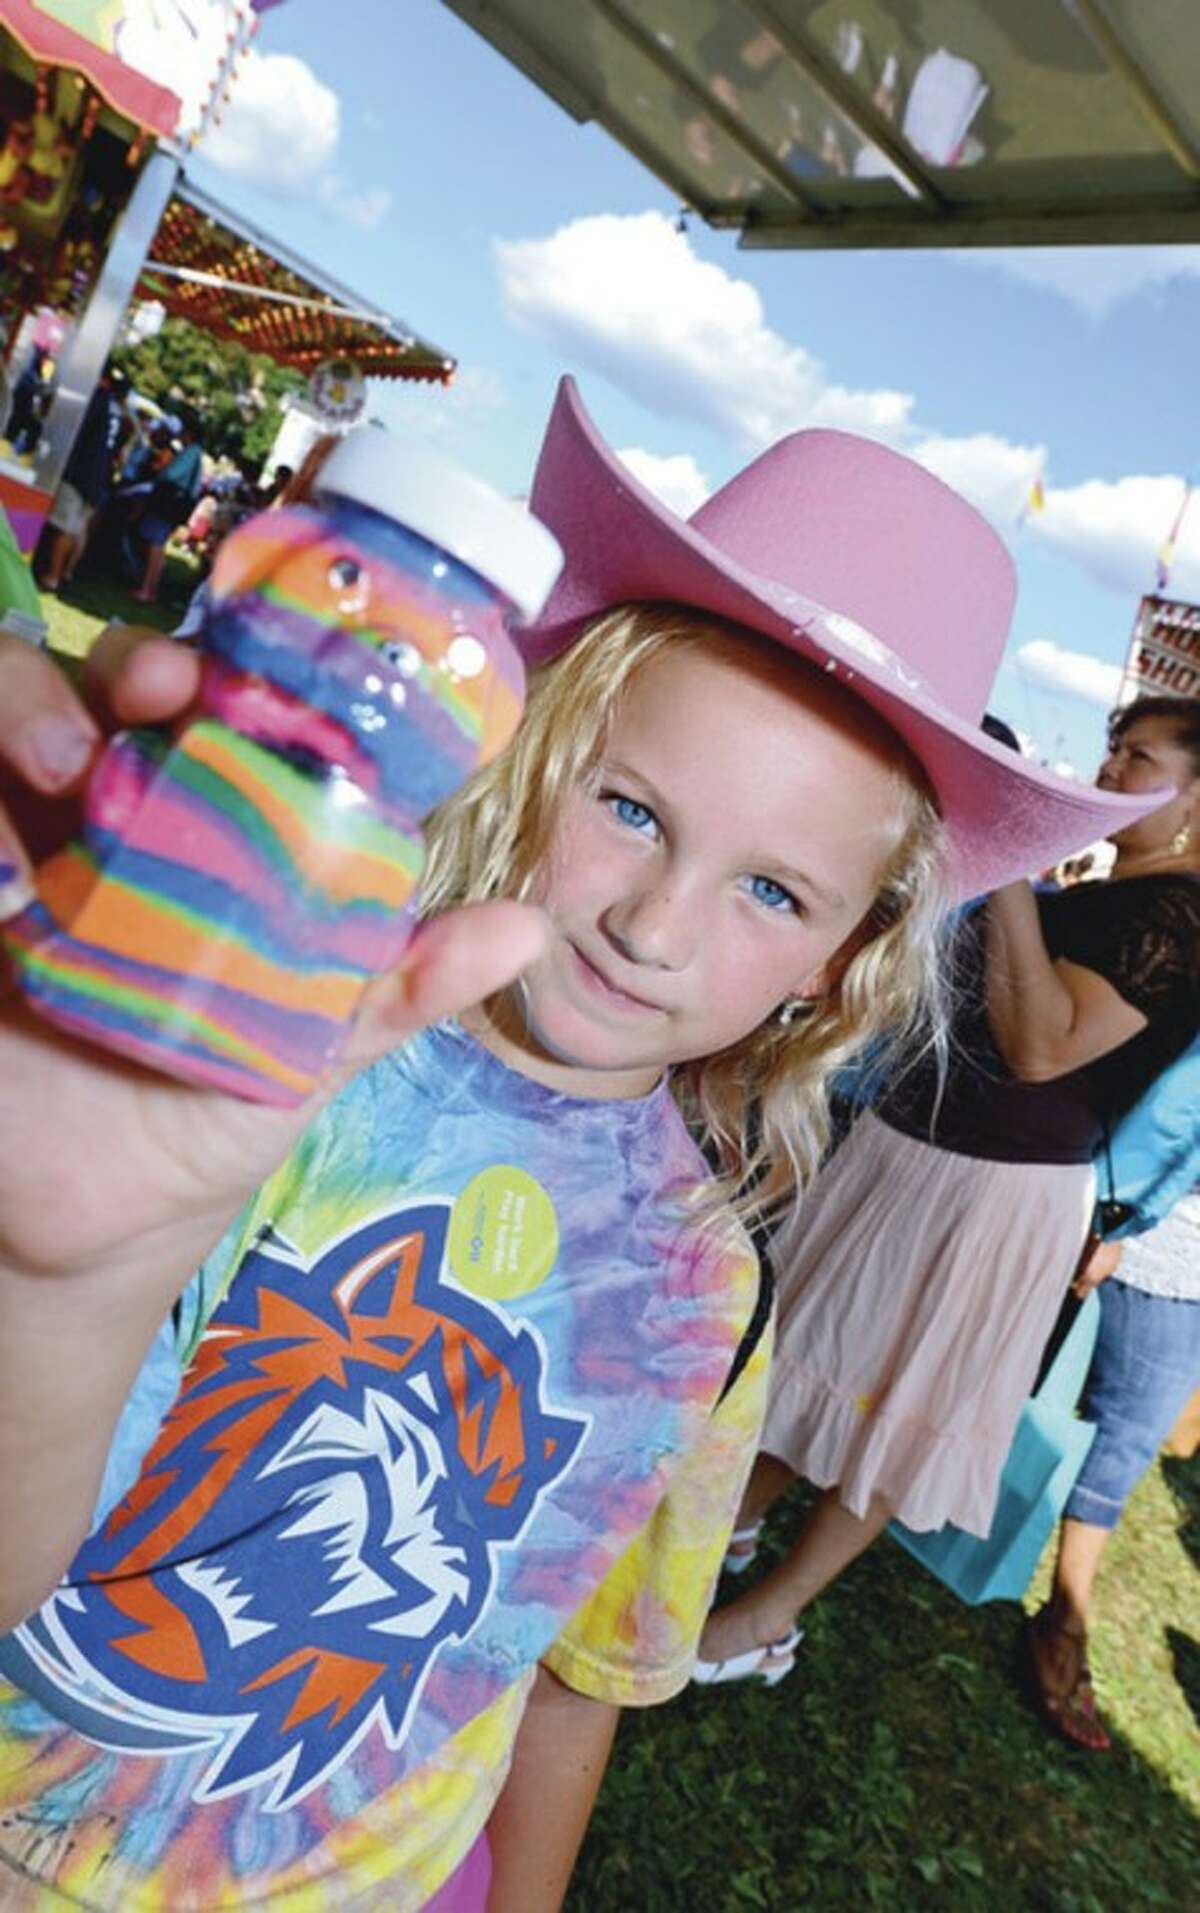 Brielle Renwick, 7, enjoys the 35th annual Oyster Festival at Veteran's Memorial Park Sunday. Hour photo / Erik Trautmann